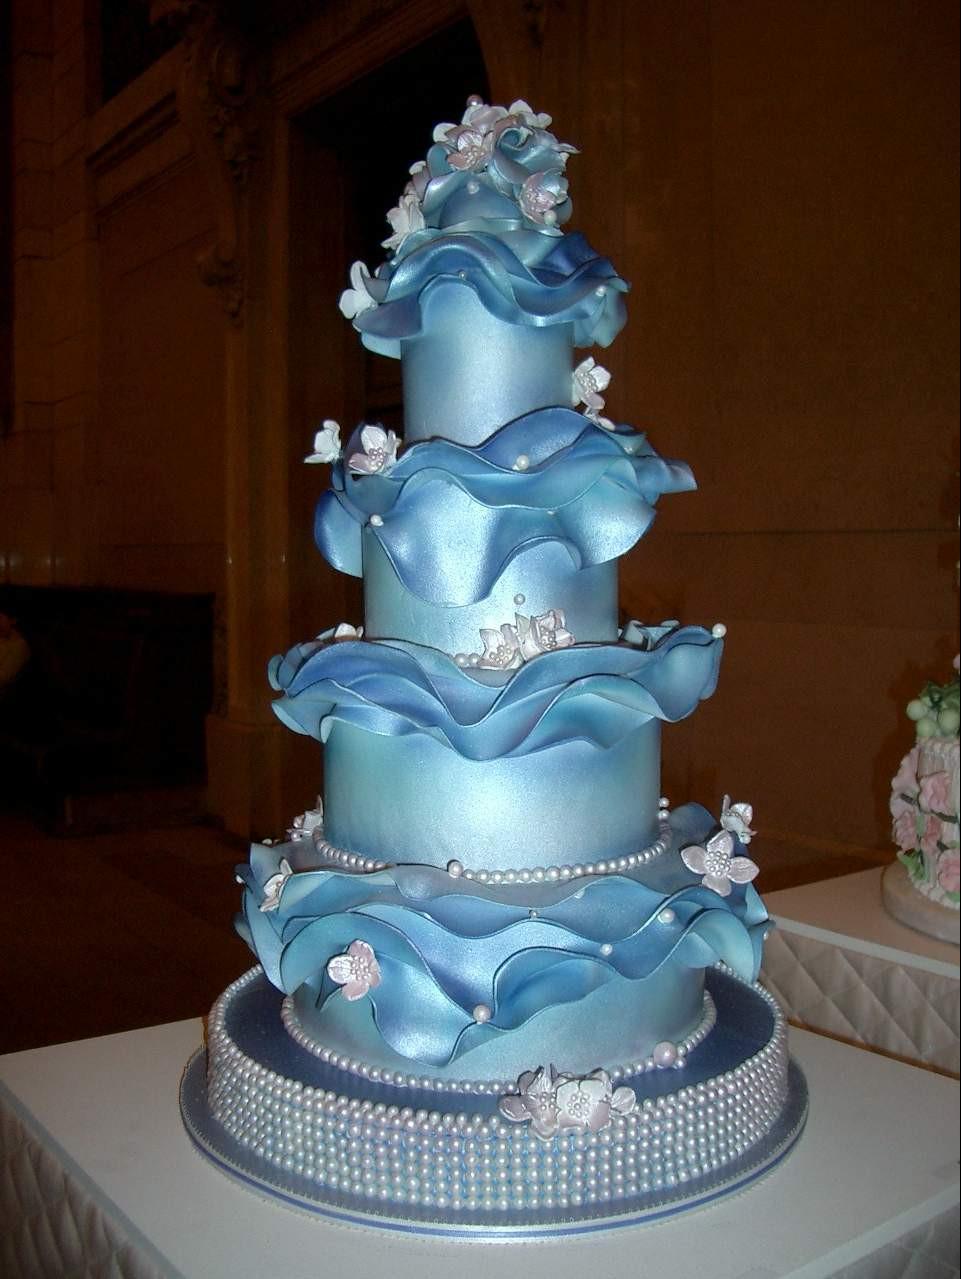 Wedding Cakes Blogs  Elexia s blog cake boss wedding cakes